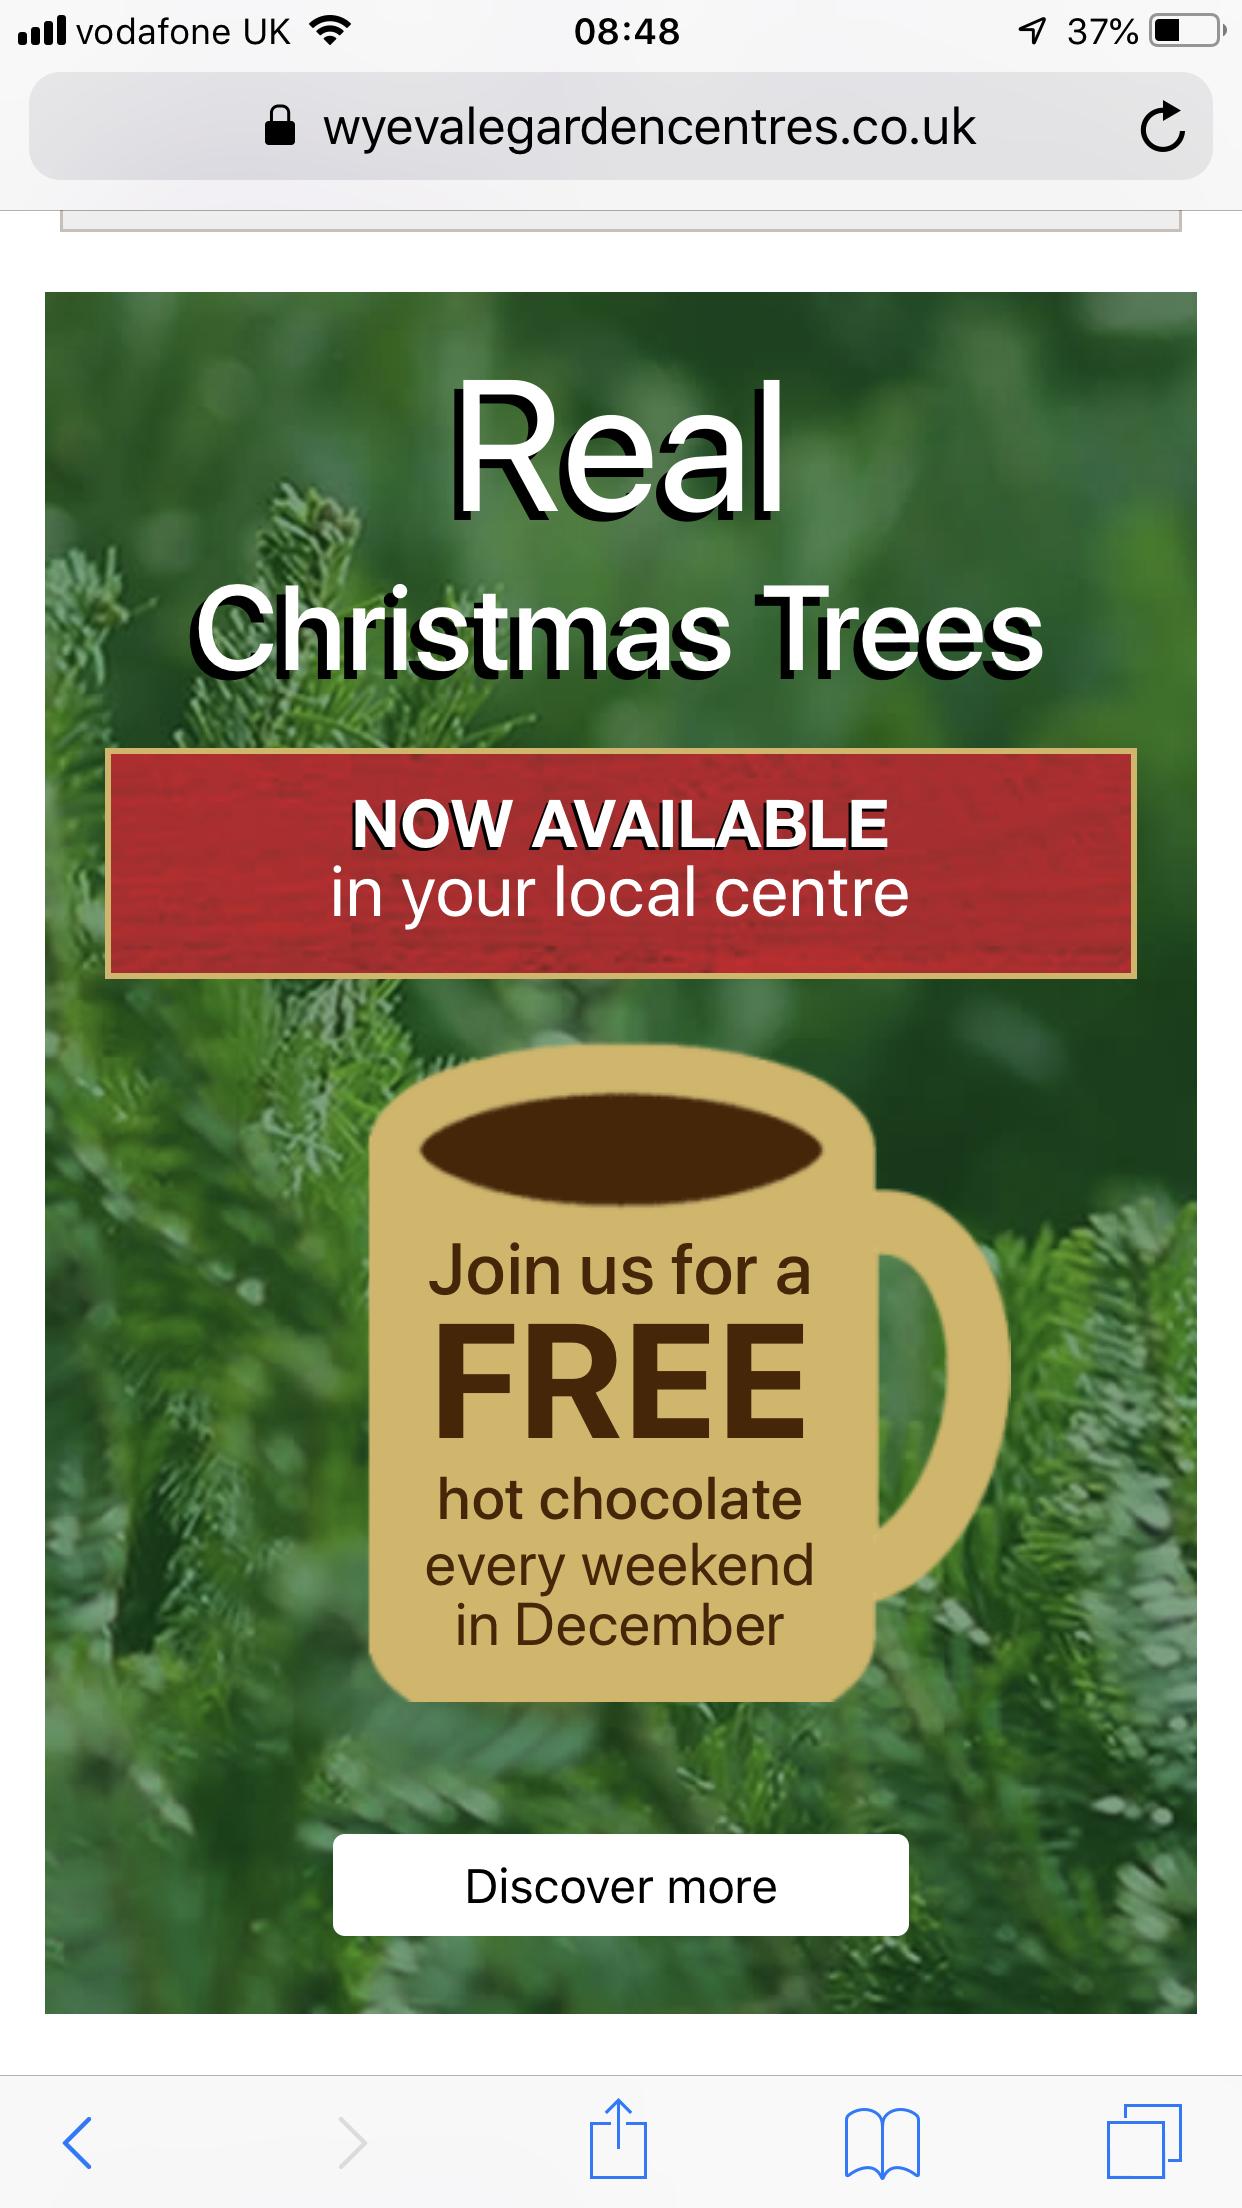 Free hot chocolate Wyevale garden centres